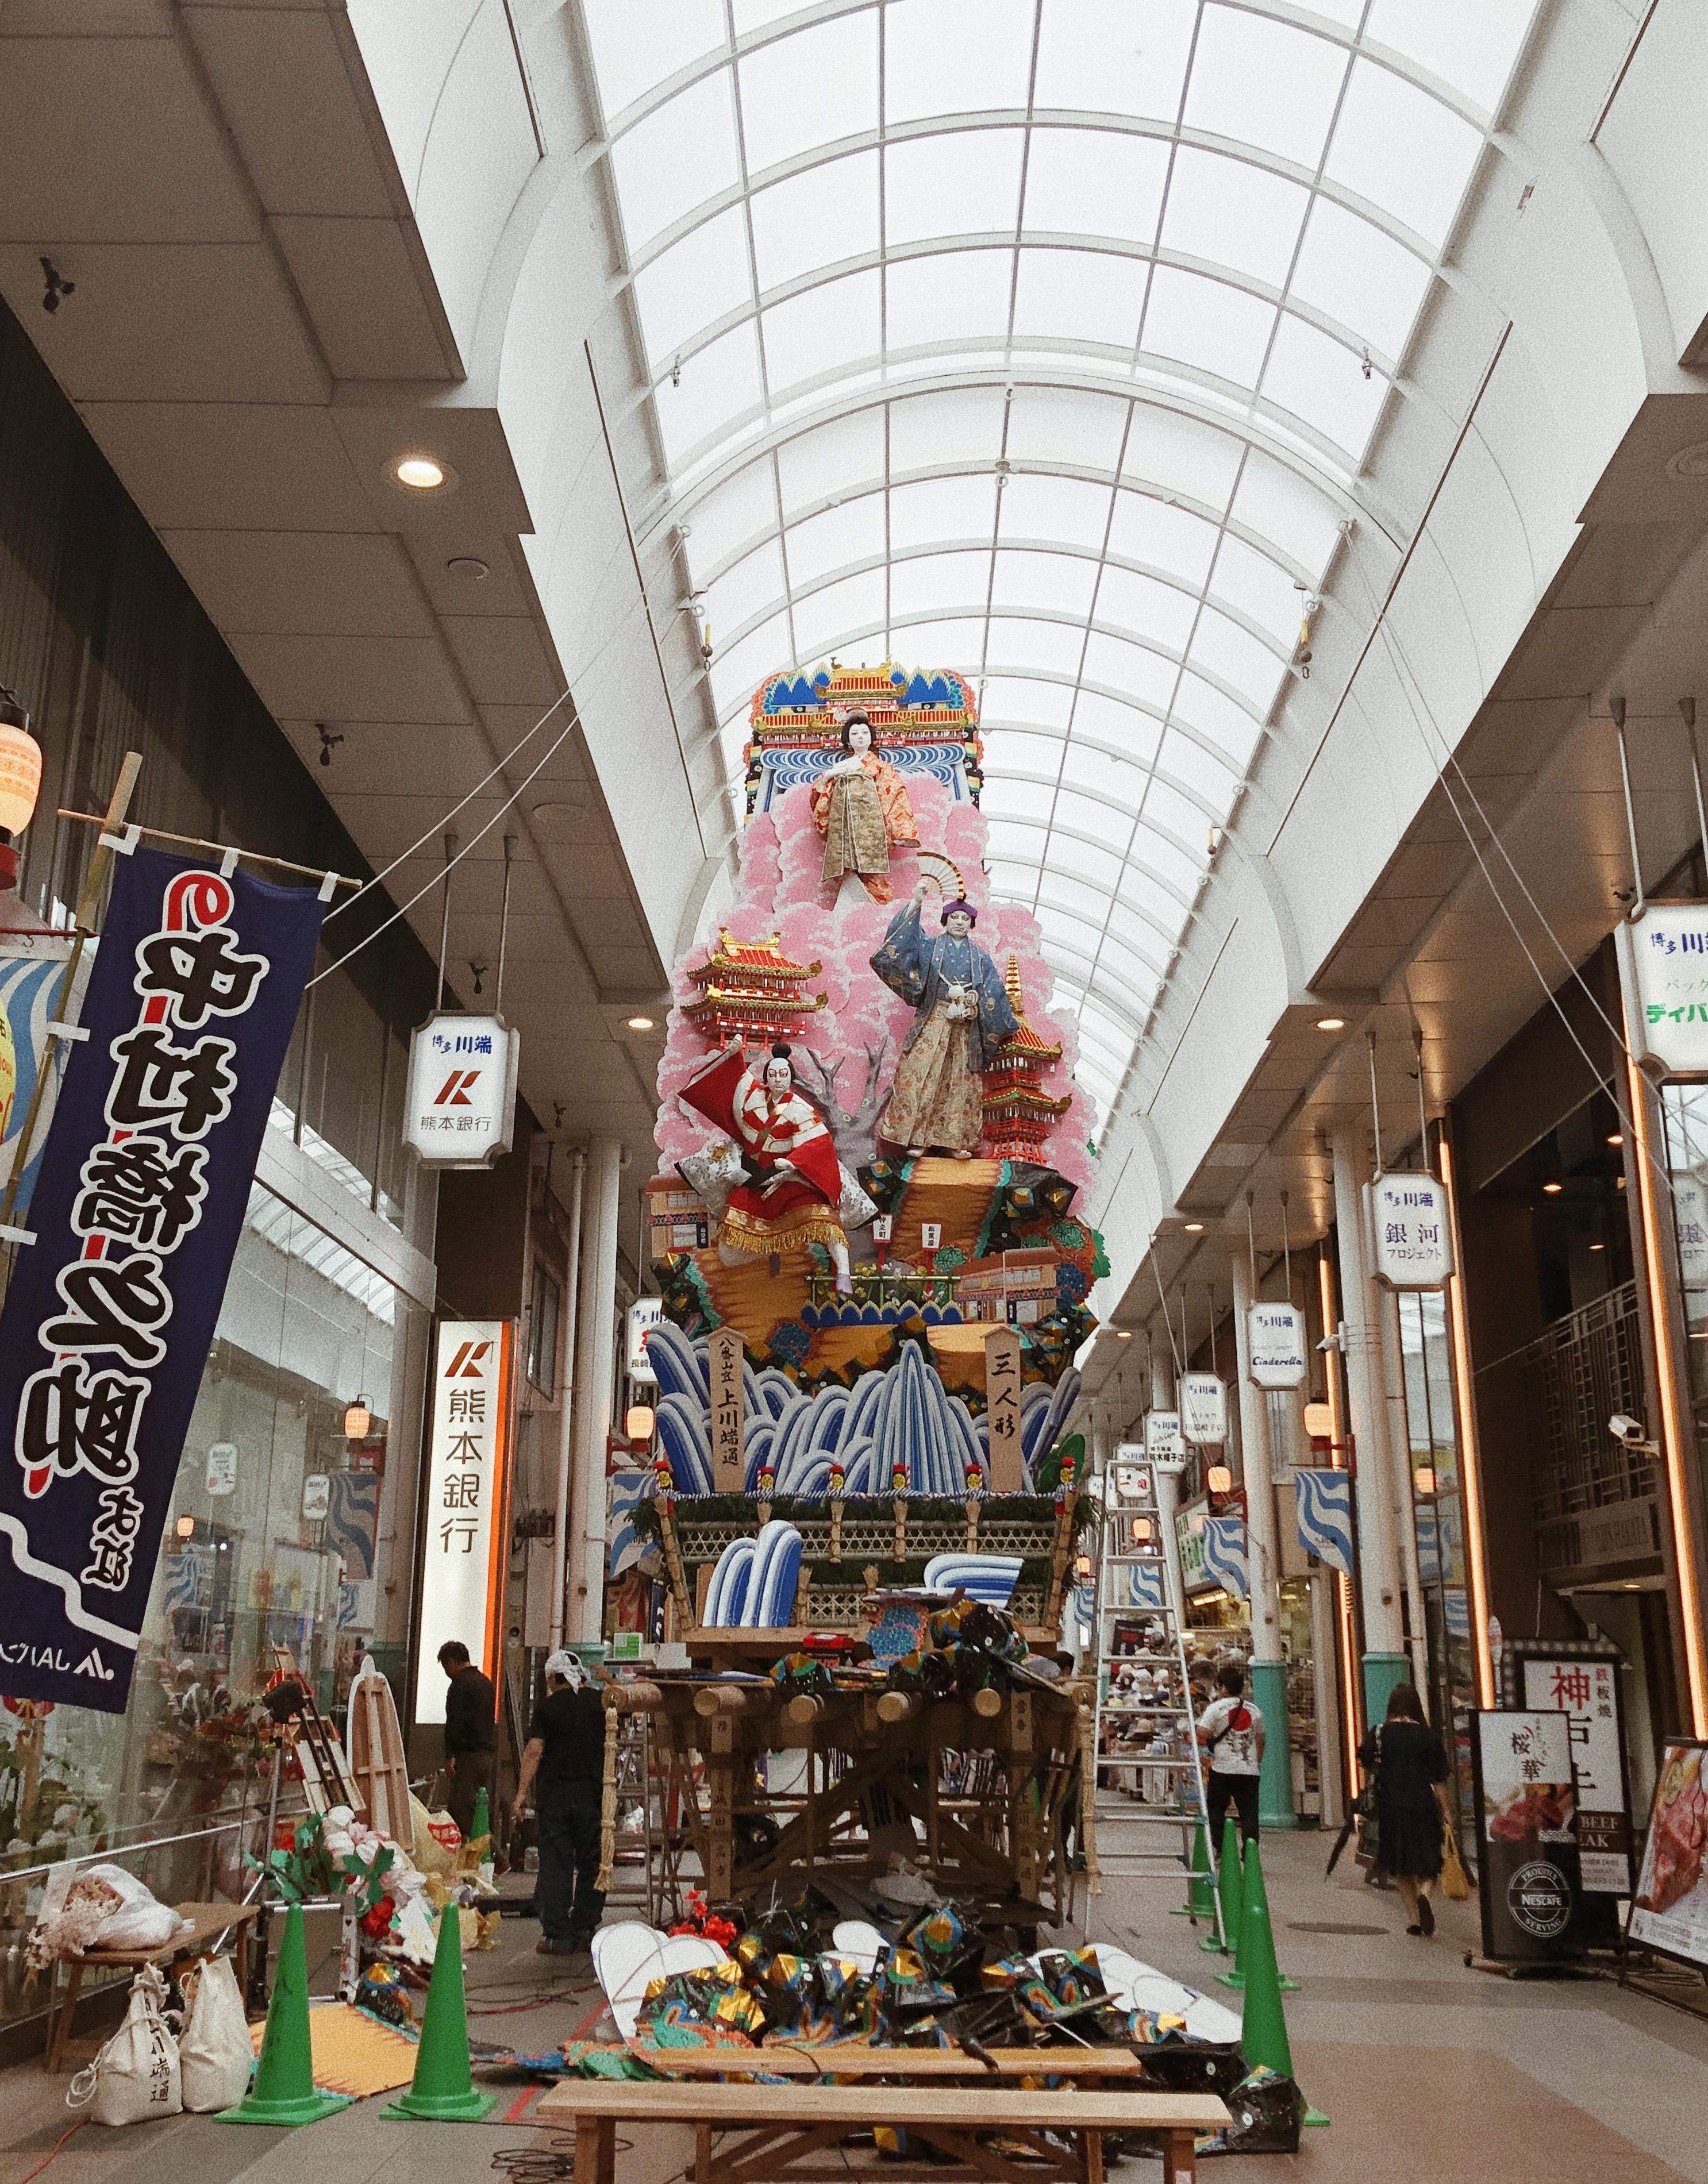 kazariyama floats: 10 meters tall, weighs 2 tons